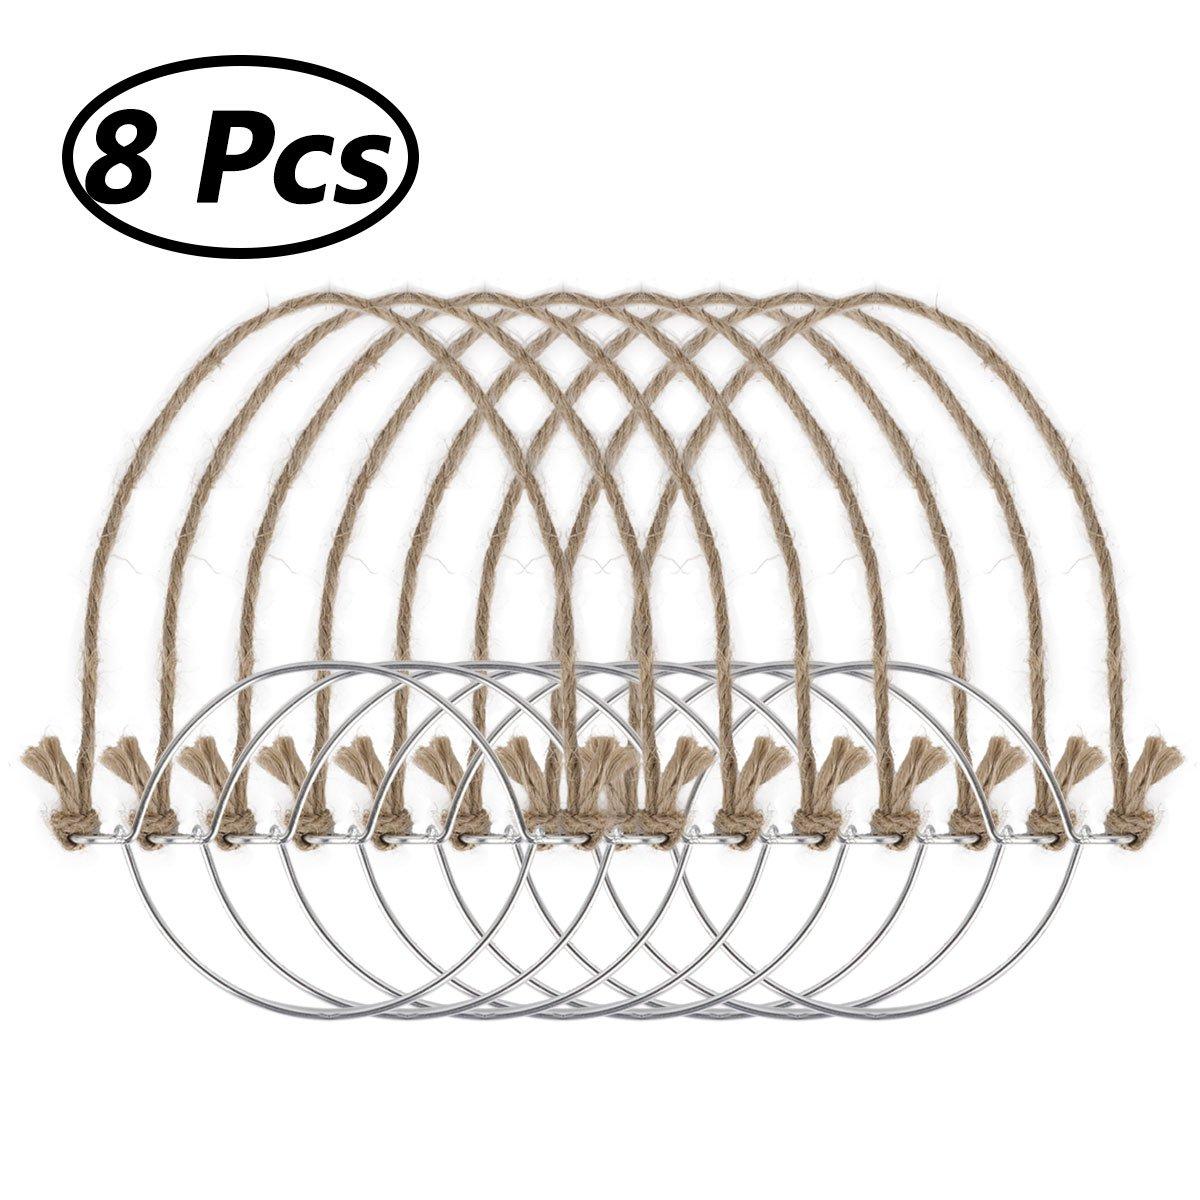 iiniim Stainless Steel Wire Handles Mason Jar Hanger, Canning Jars Hanger, Ball Pint Jar, Jar Hanging Hook for Regular Mouth Mason 8PCS Burlap Hangers One Size